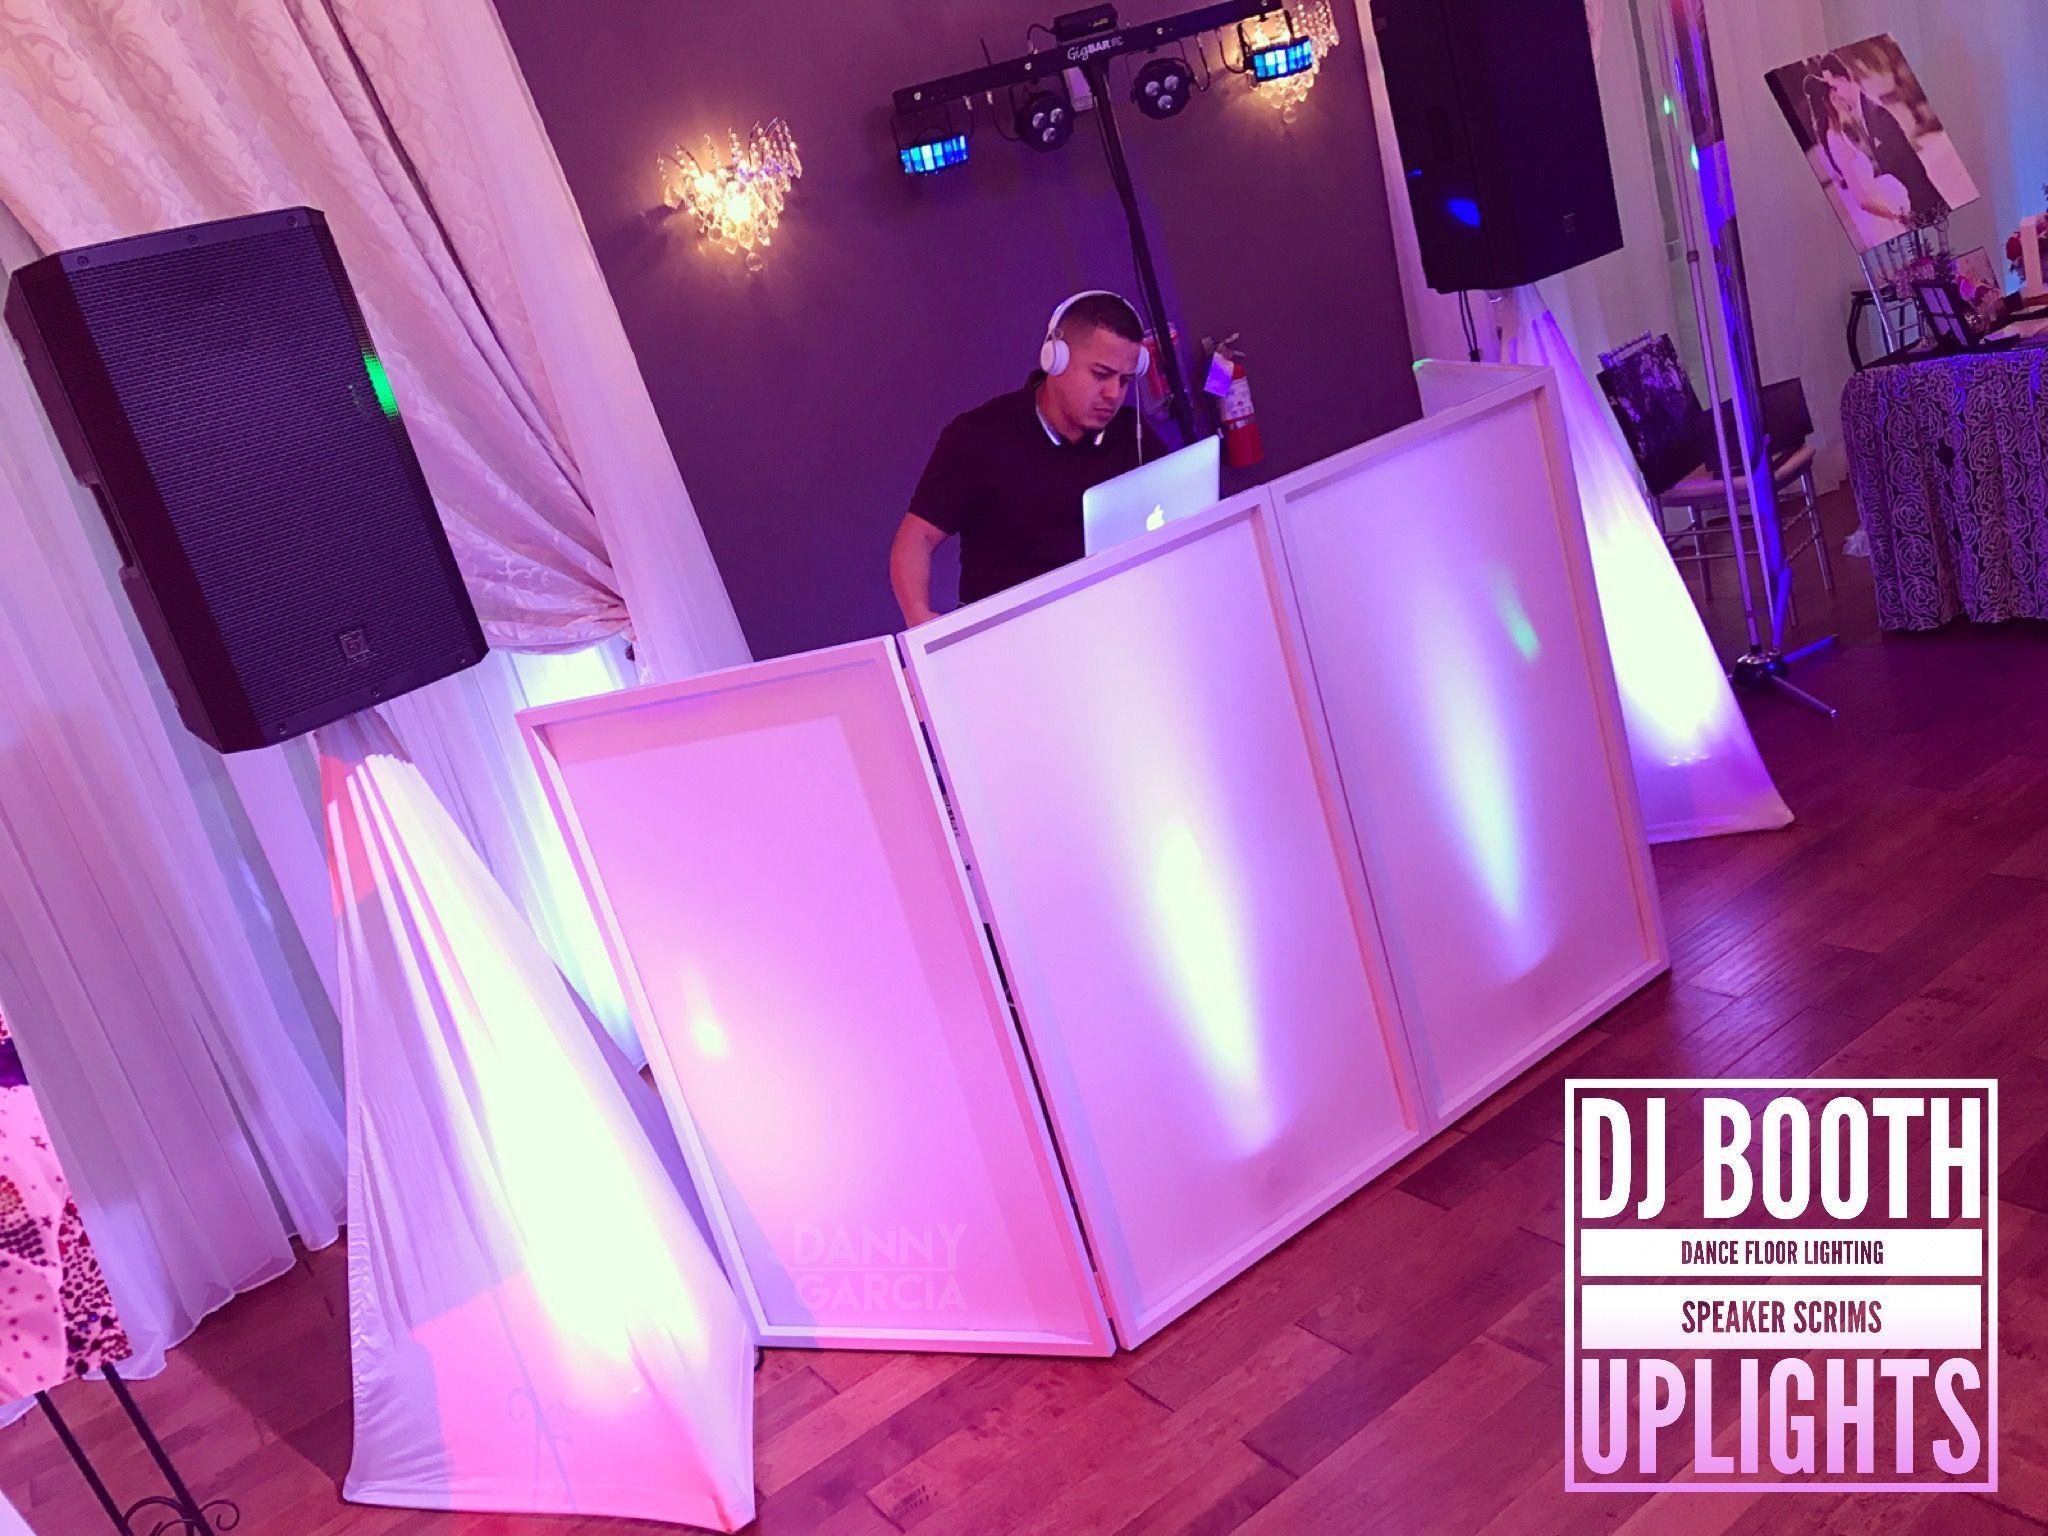 Dj Booth Setup For Weddings Uplights Speaker Scrims Dance Floor Lighting Www Djdannygarcia Com Wedding Dj Setup Dj Booth Wedding Dj Booth